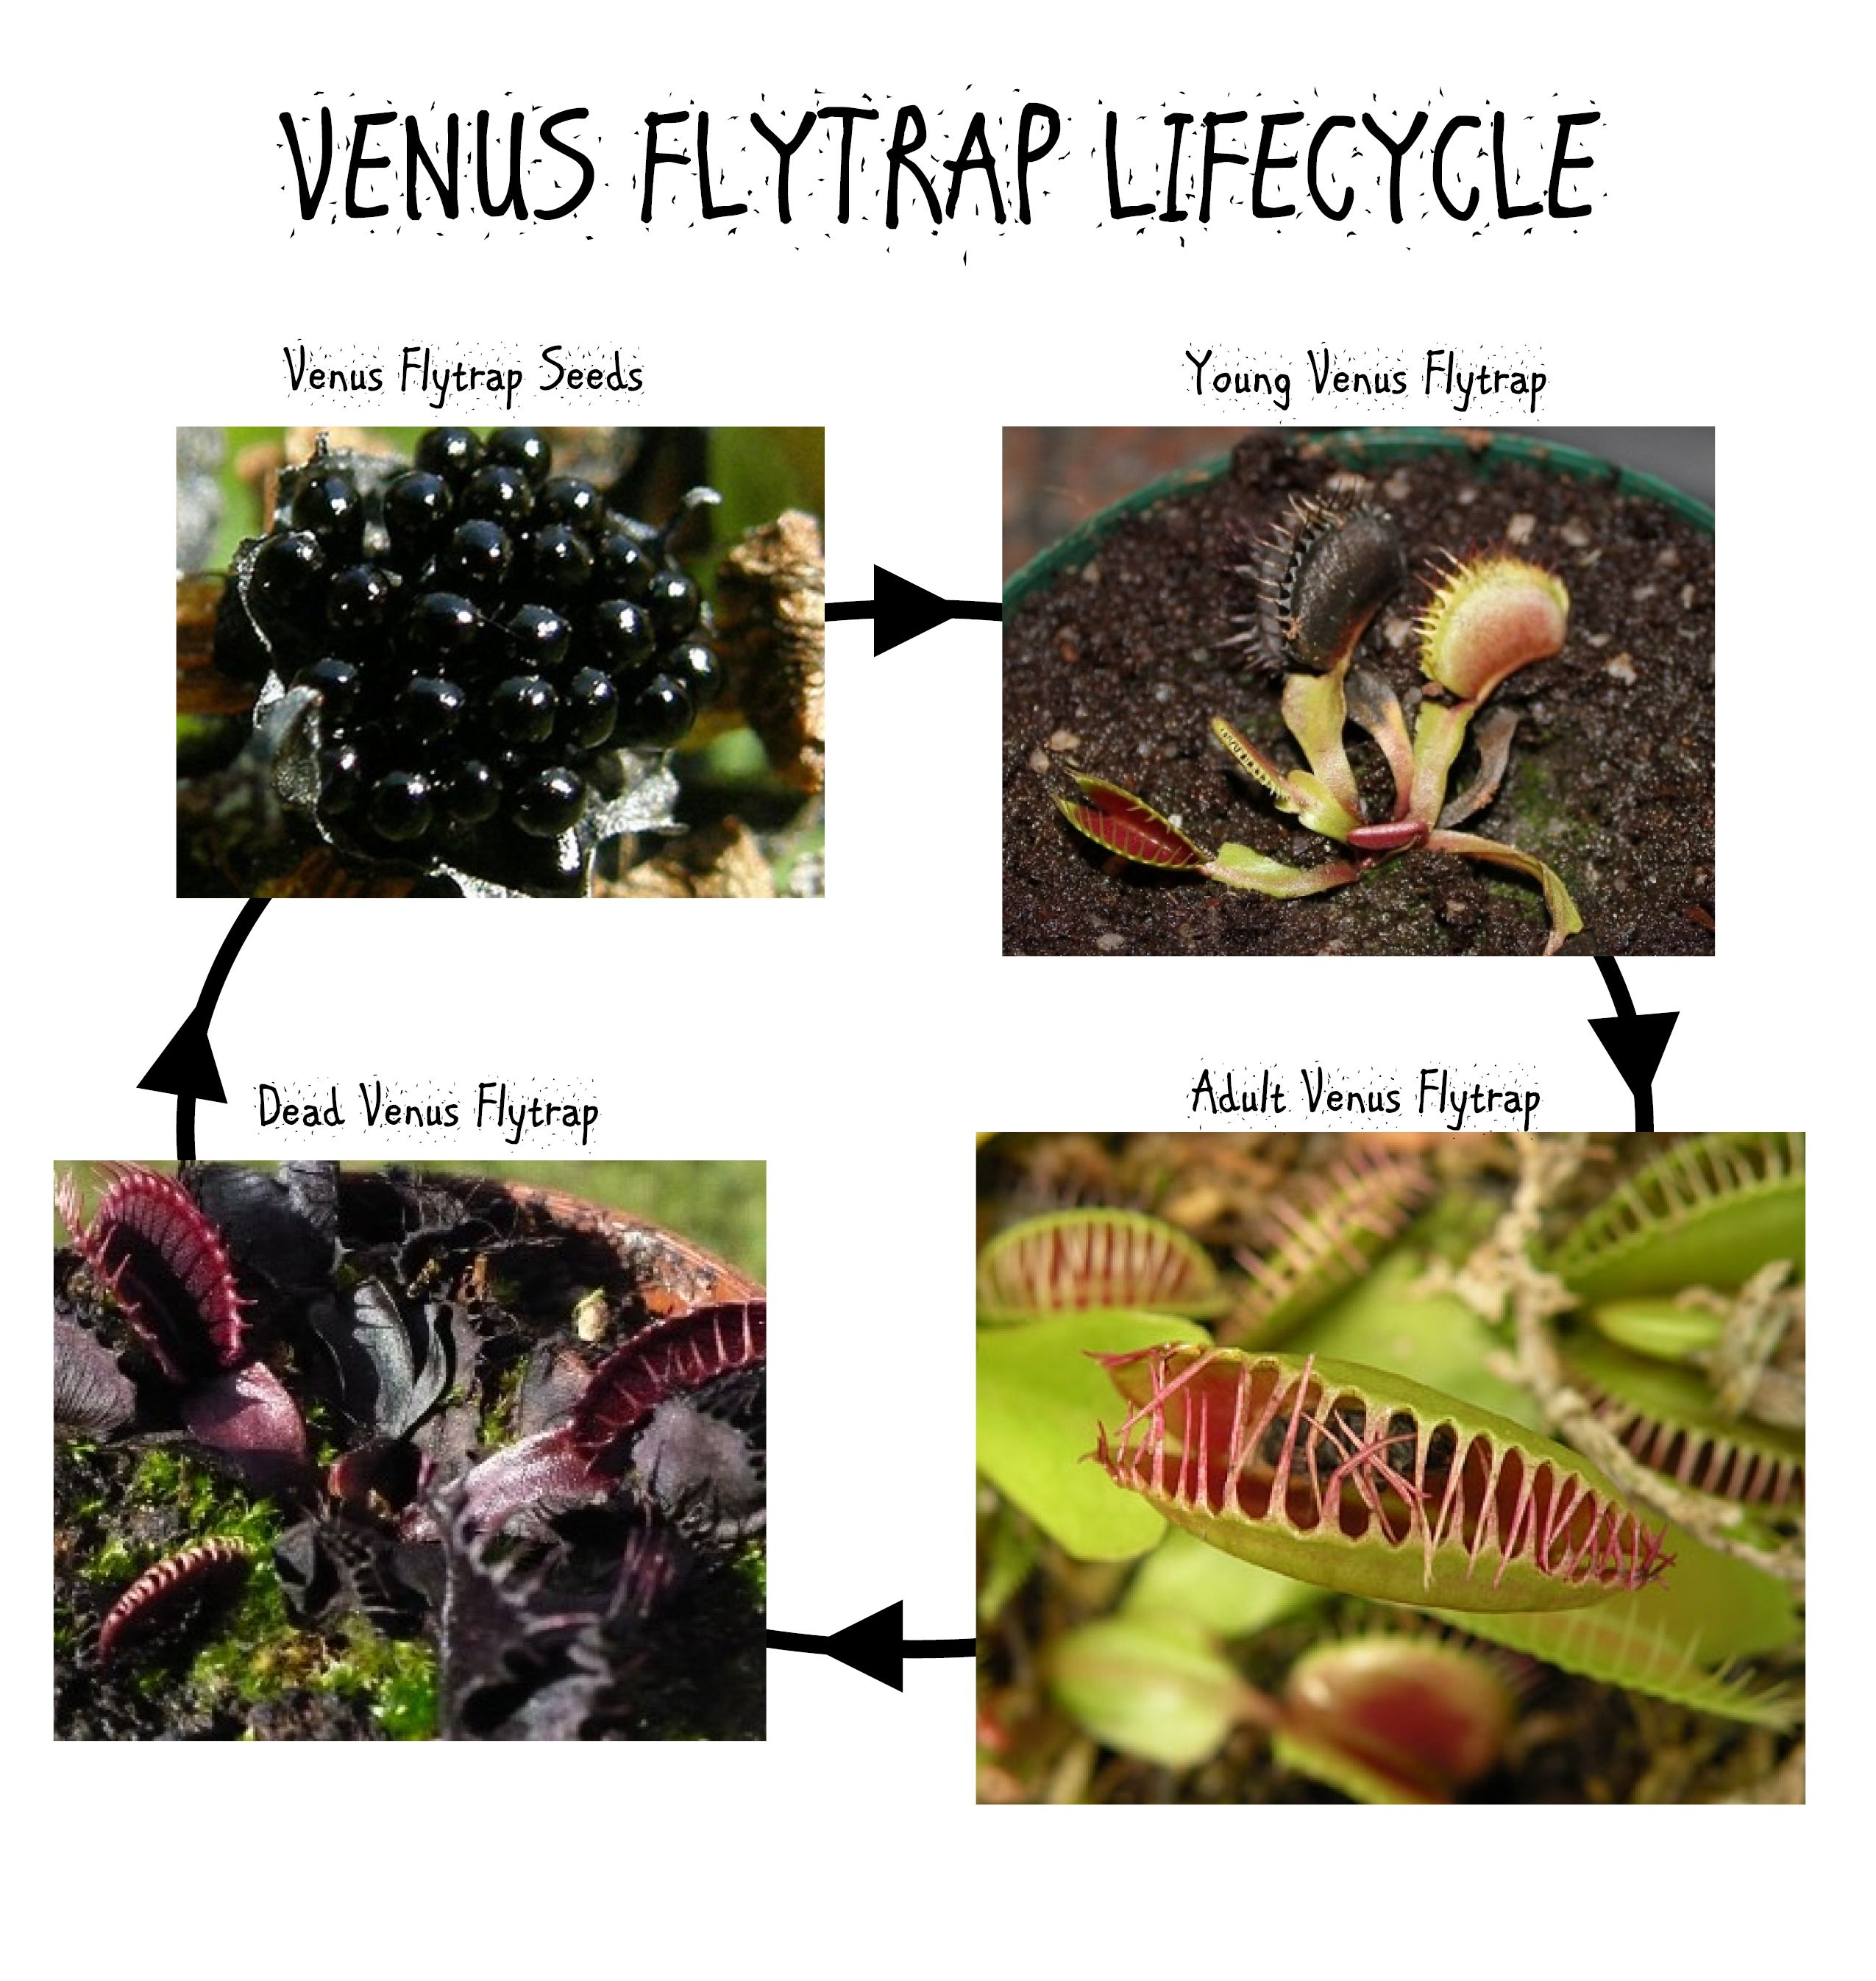 venus flytrap life cycle diagram here is a diagram of that today rh 1 jghwe kinderhilfe mingalabar de Venus Fly Trap Diagram How It Eats Diagram of Venus Fly Trap Plants